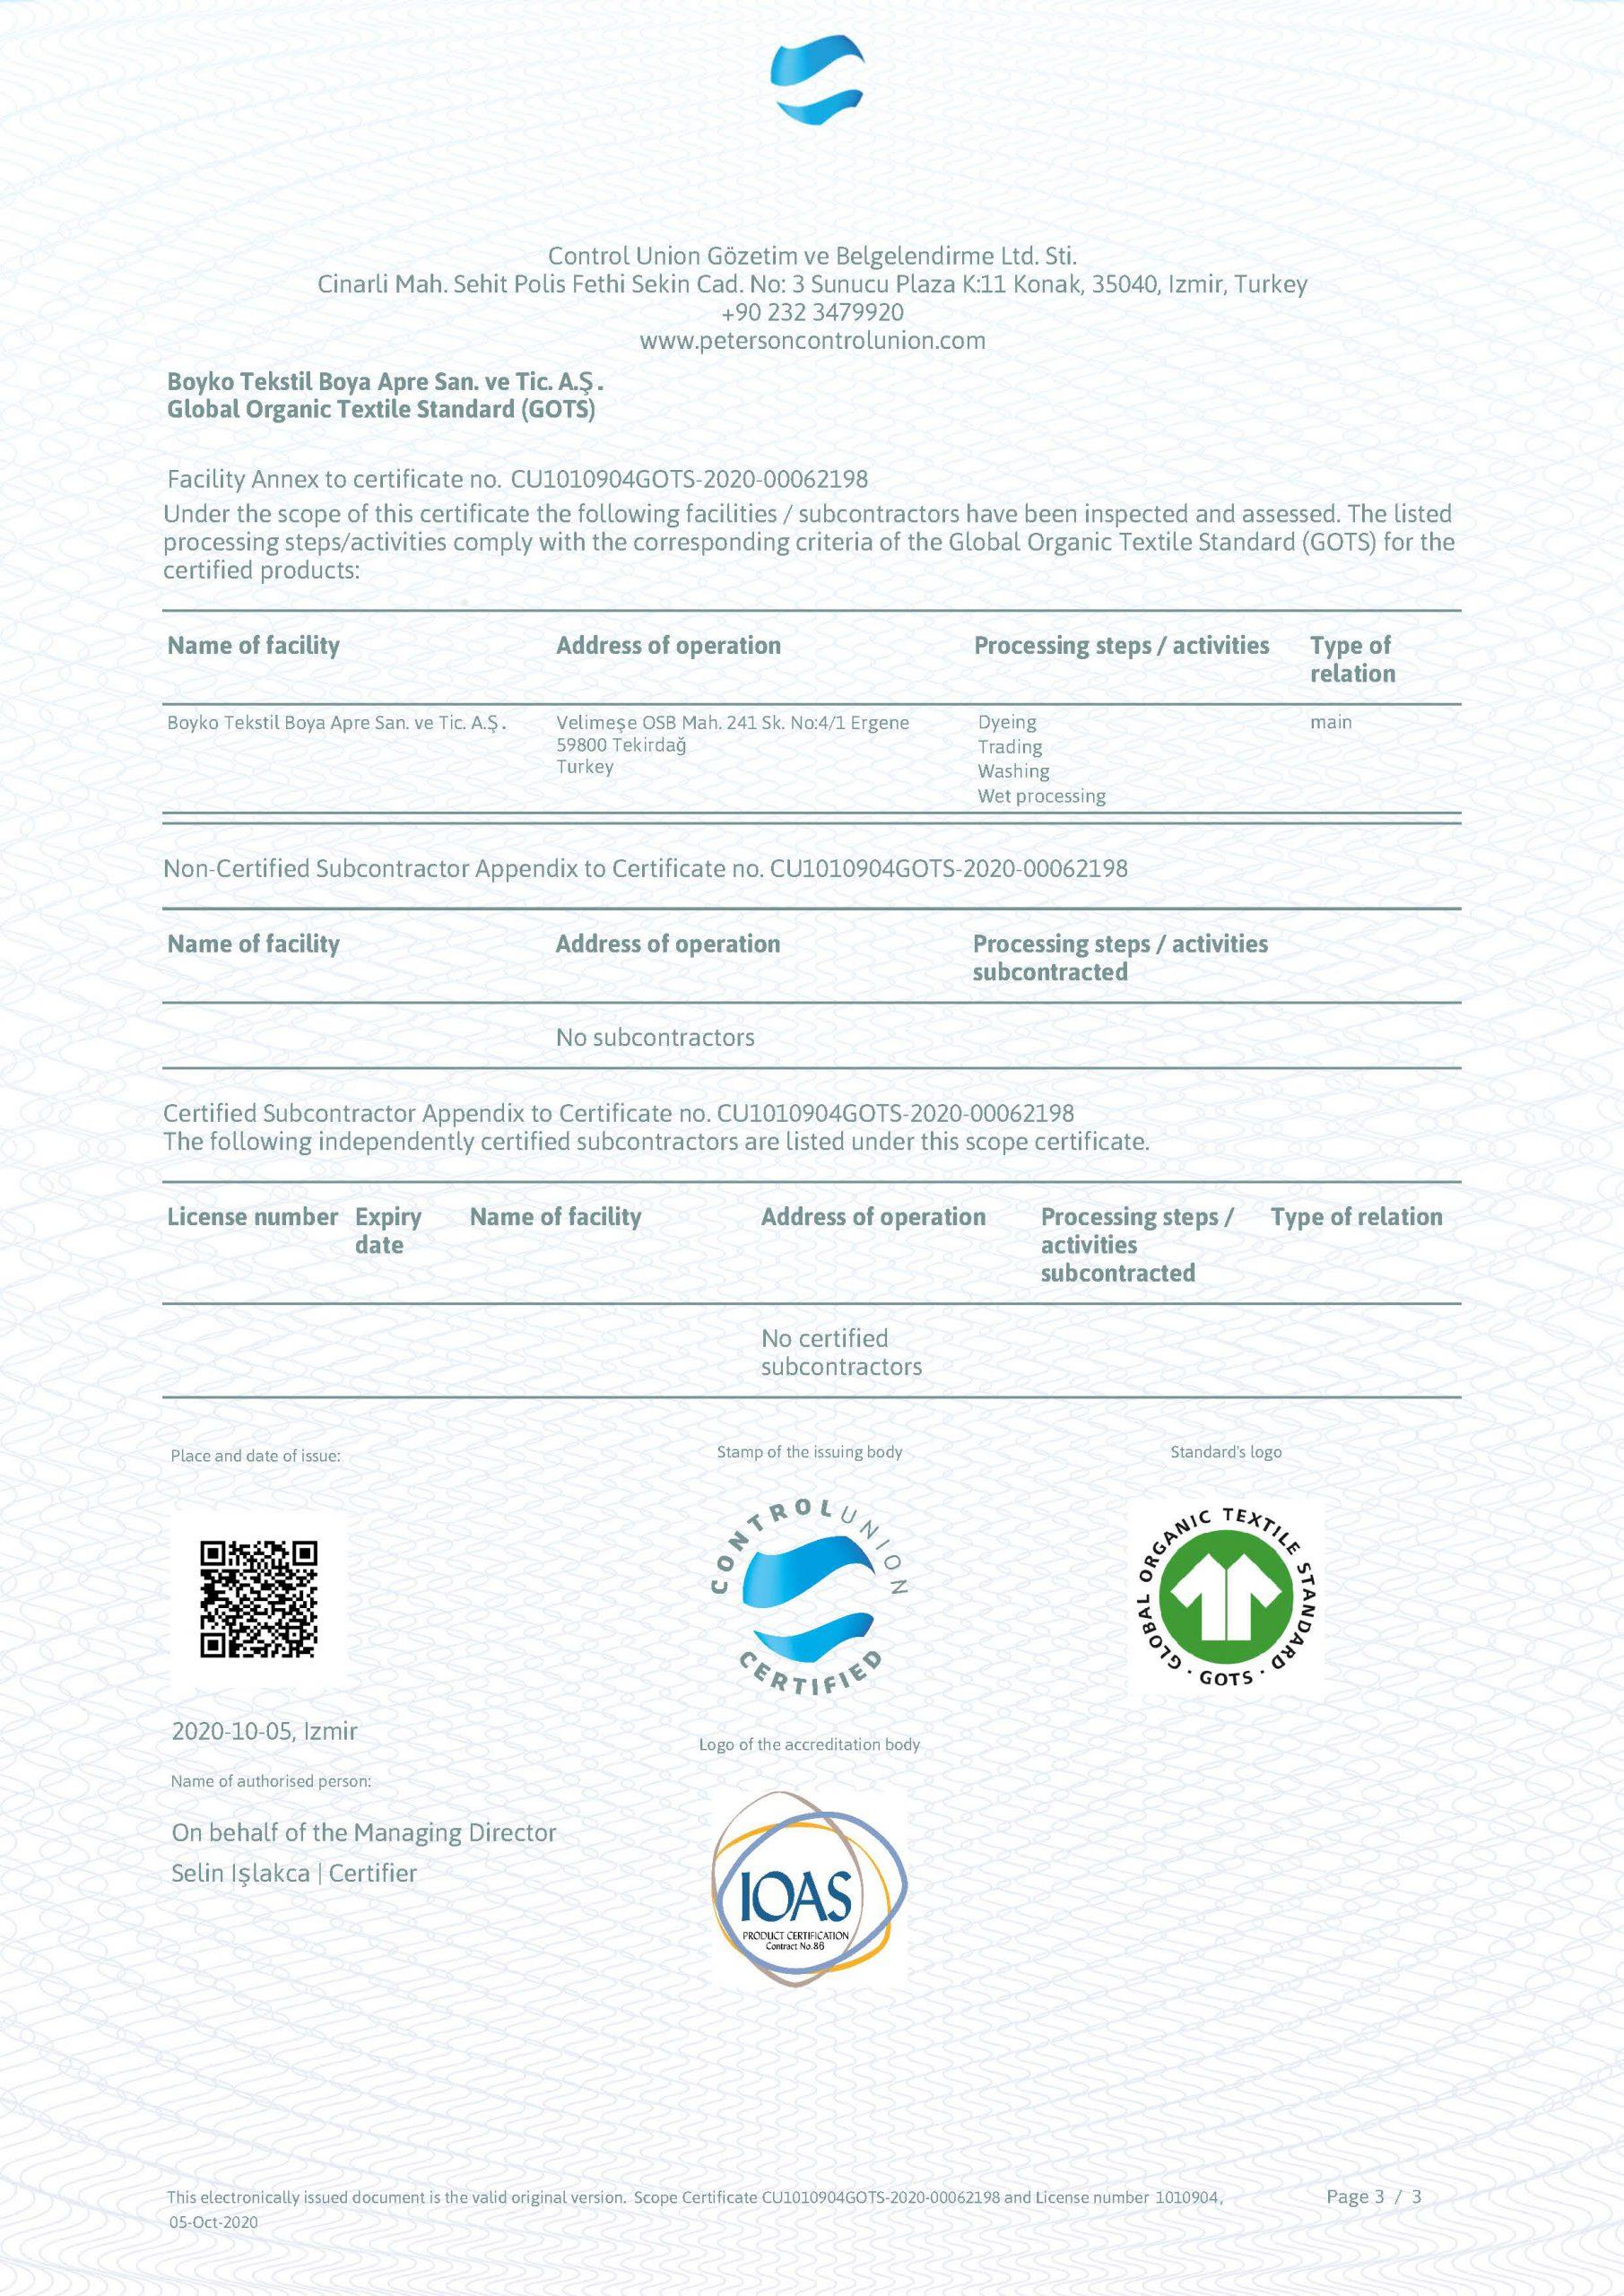 GOTS_Scope_Certificate_2020-10-05 16_56_56 UTC_Page_3